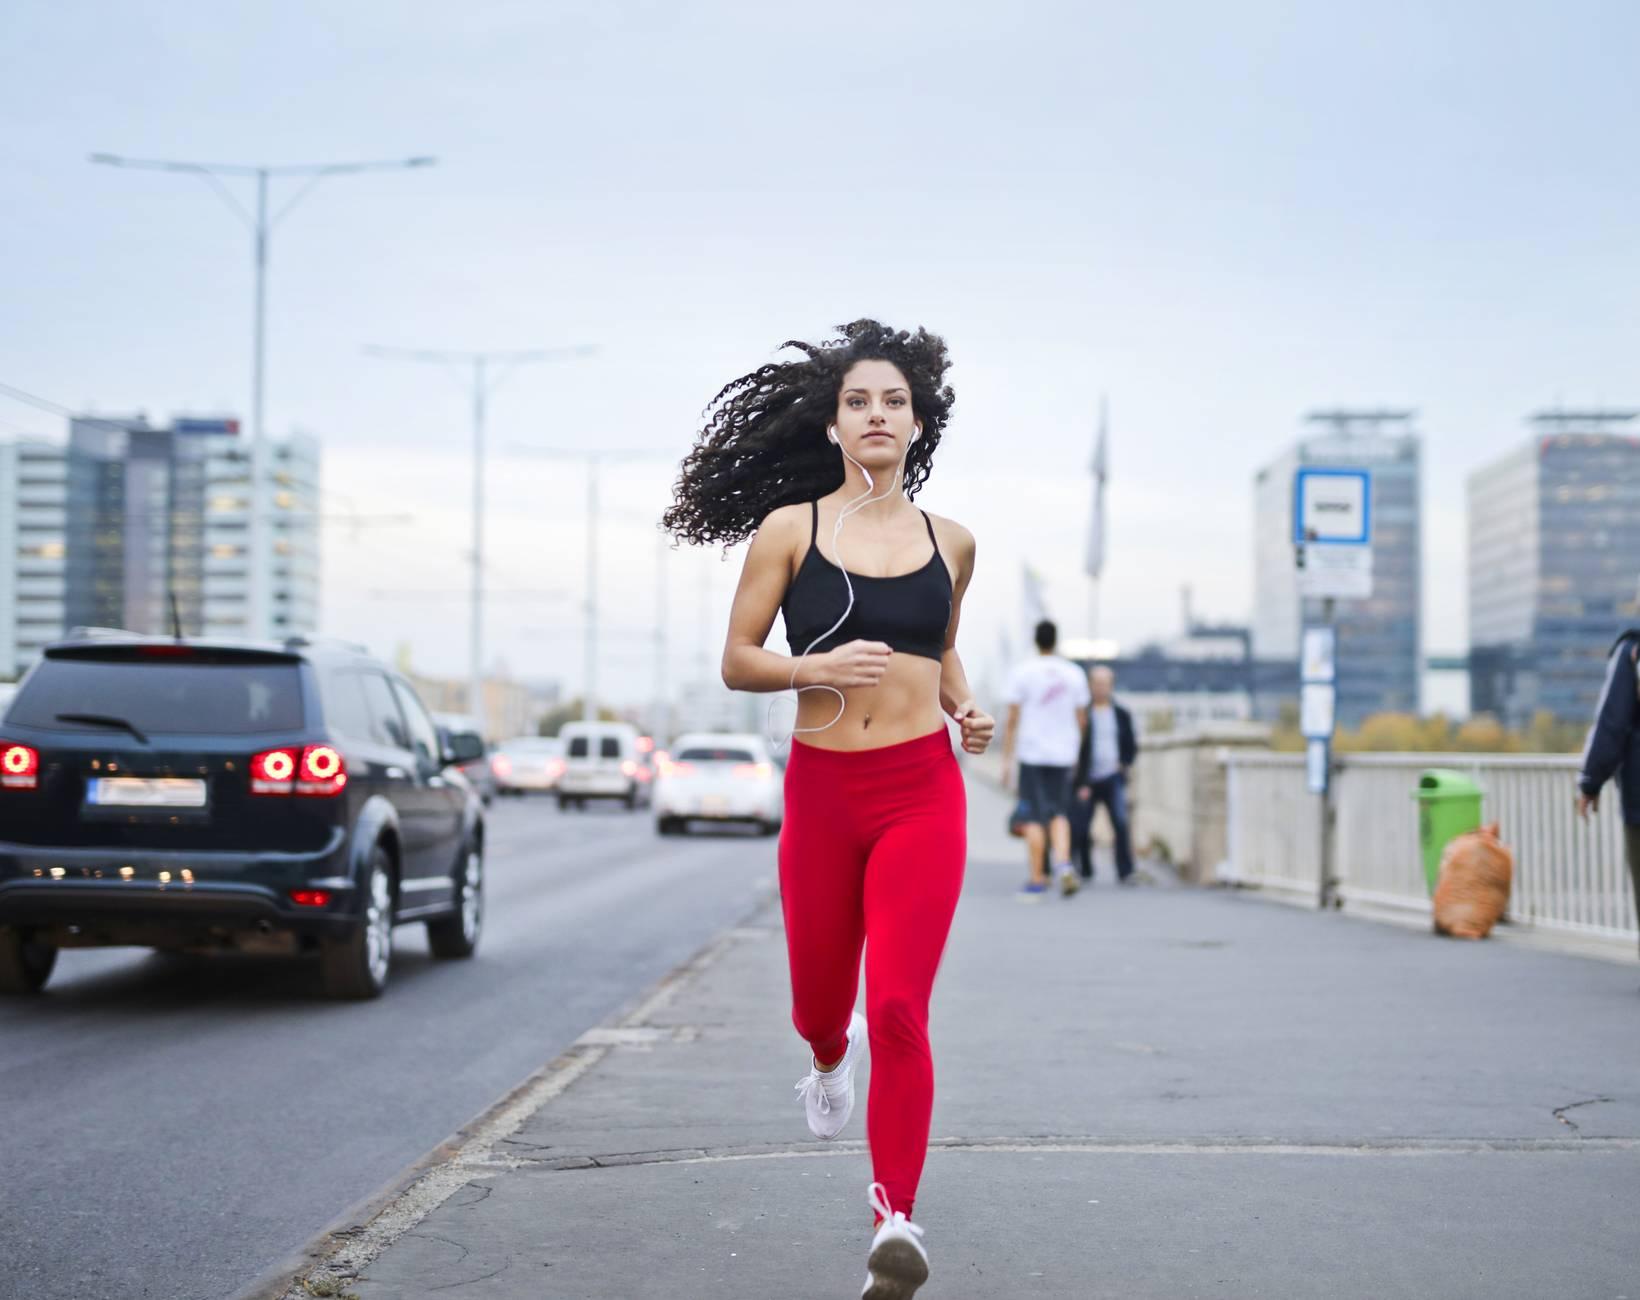 Mujer corriendo por la calle